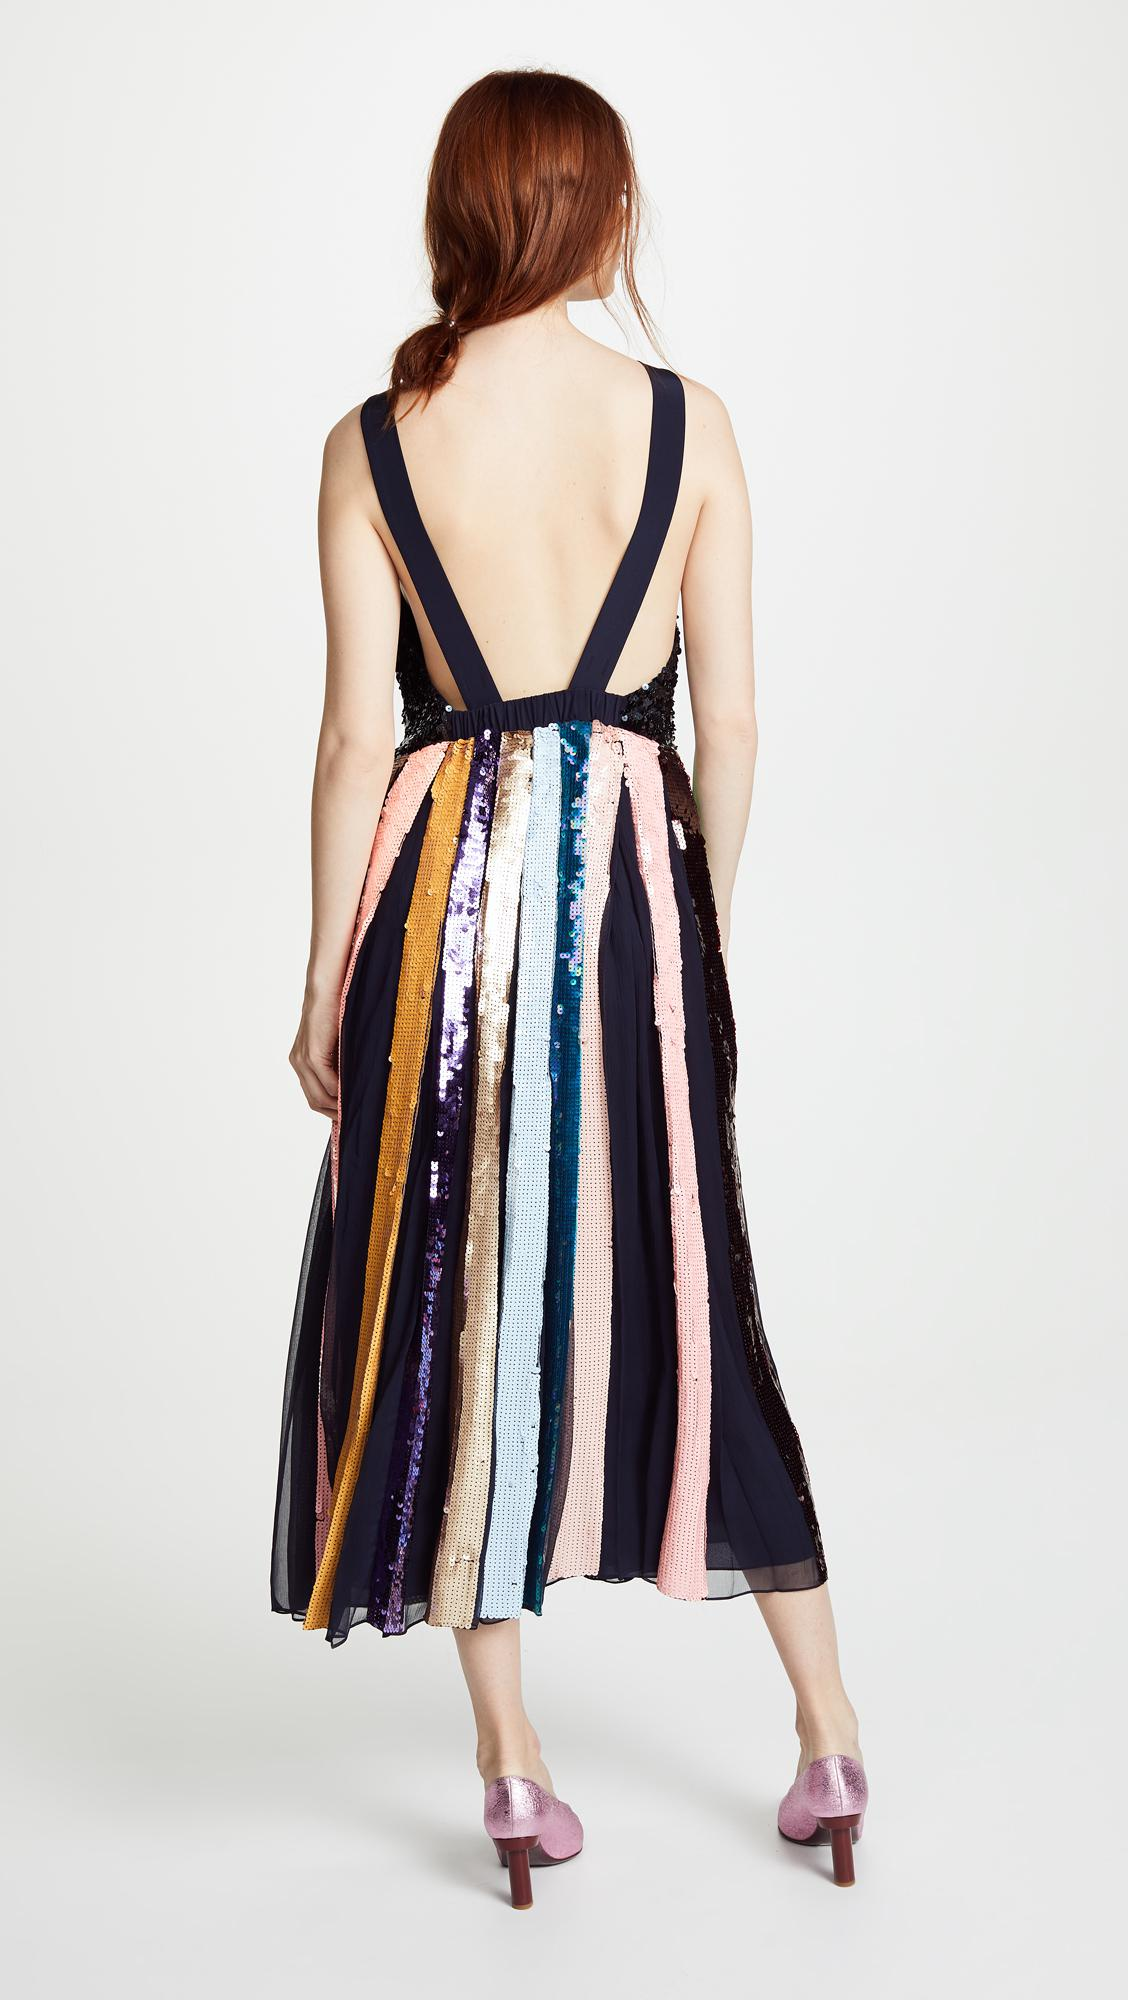 d26094017e8 Lyst - Tibi Beaded Sequin Overall Dress in Blue